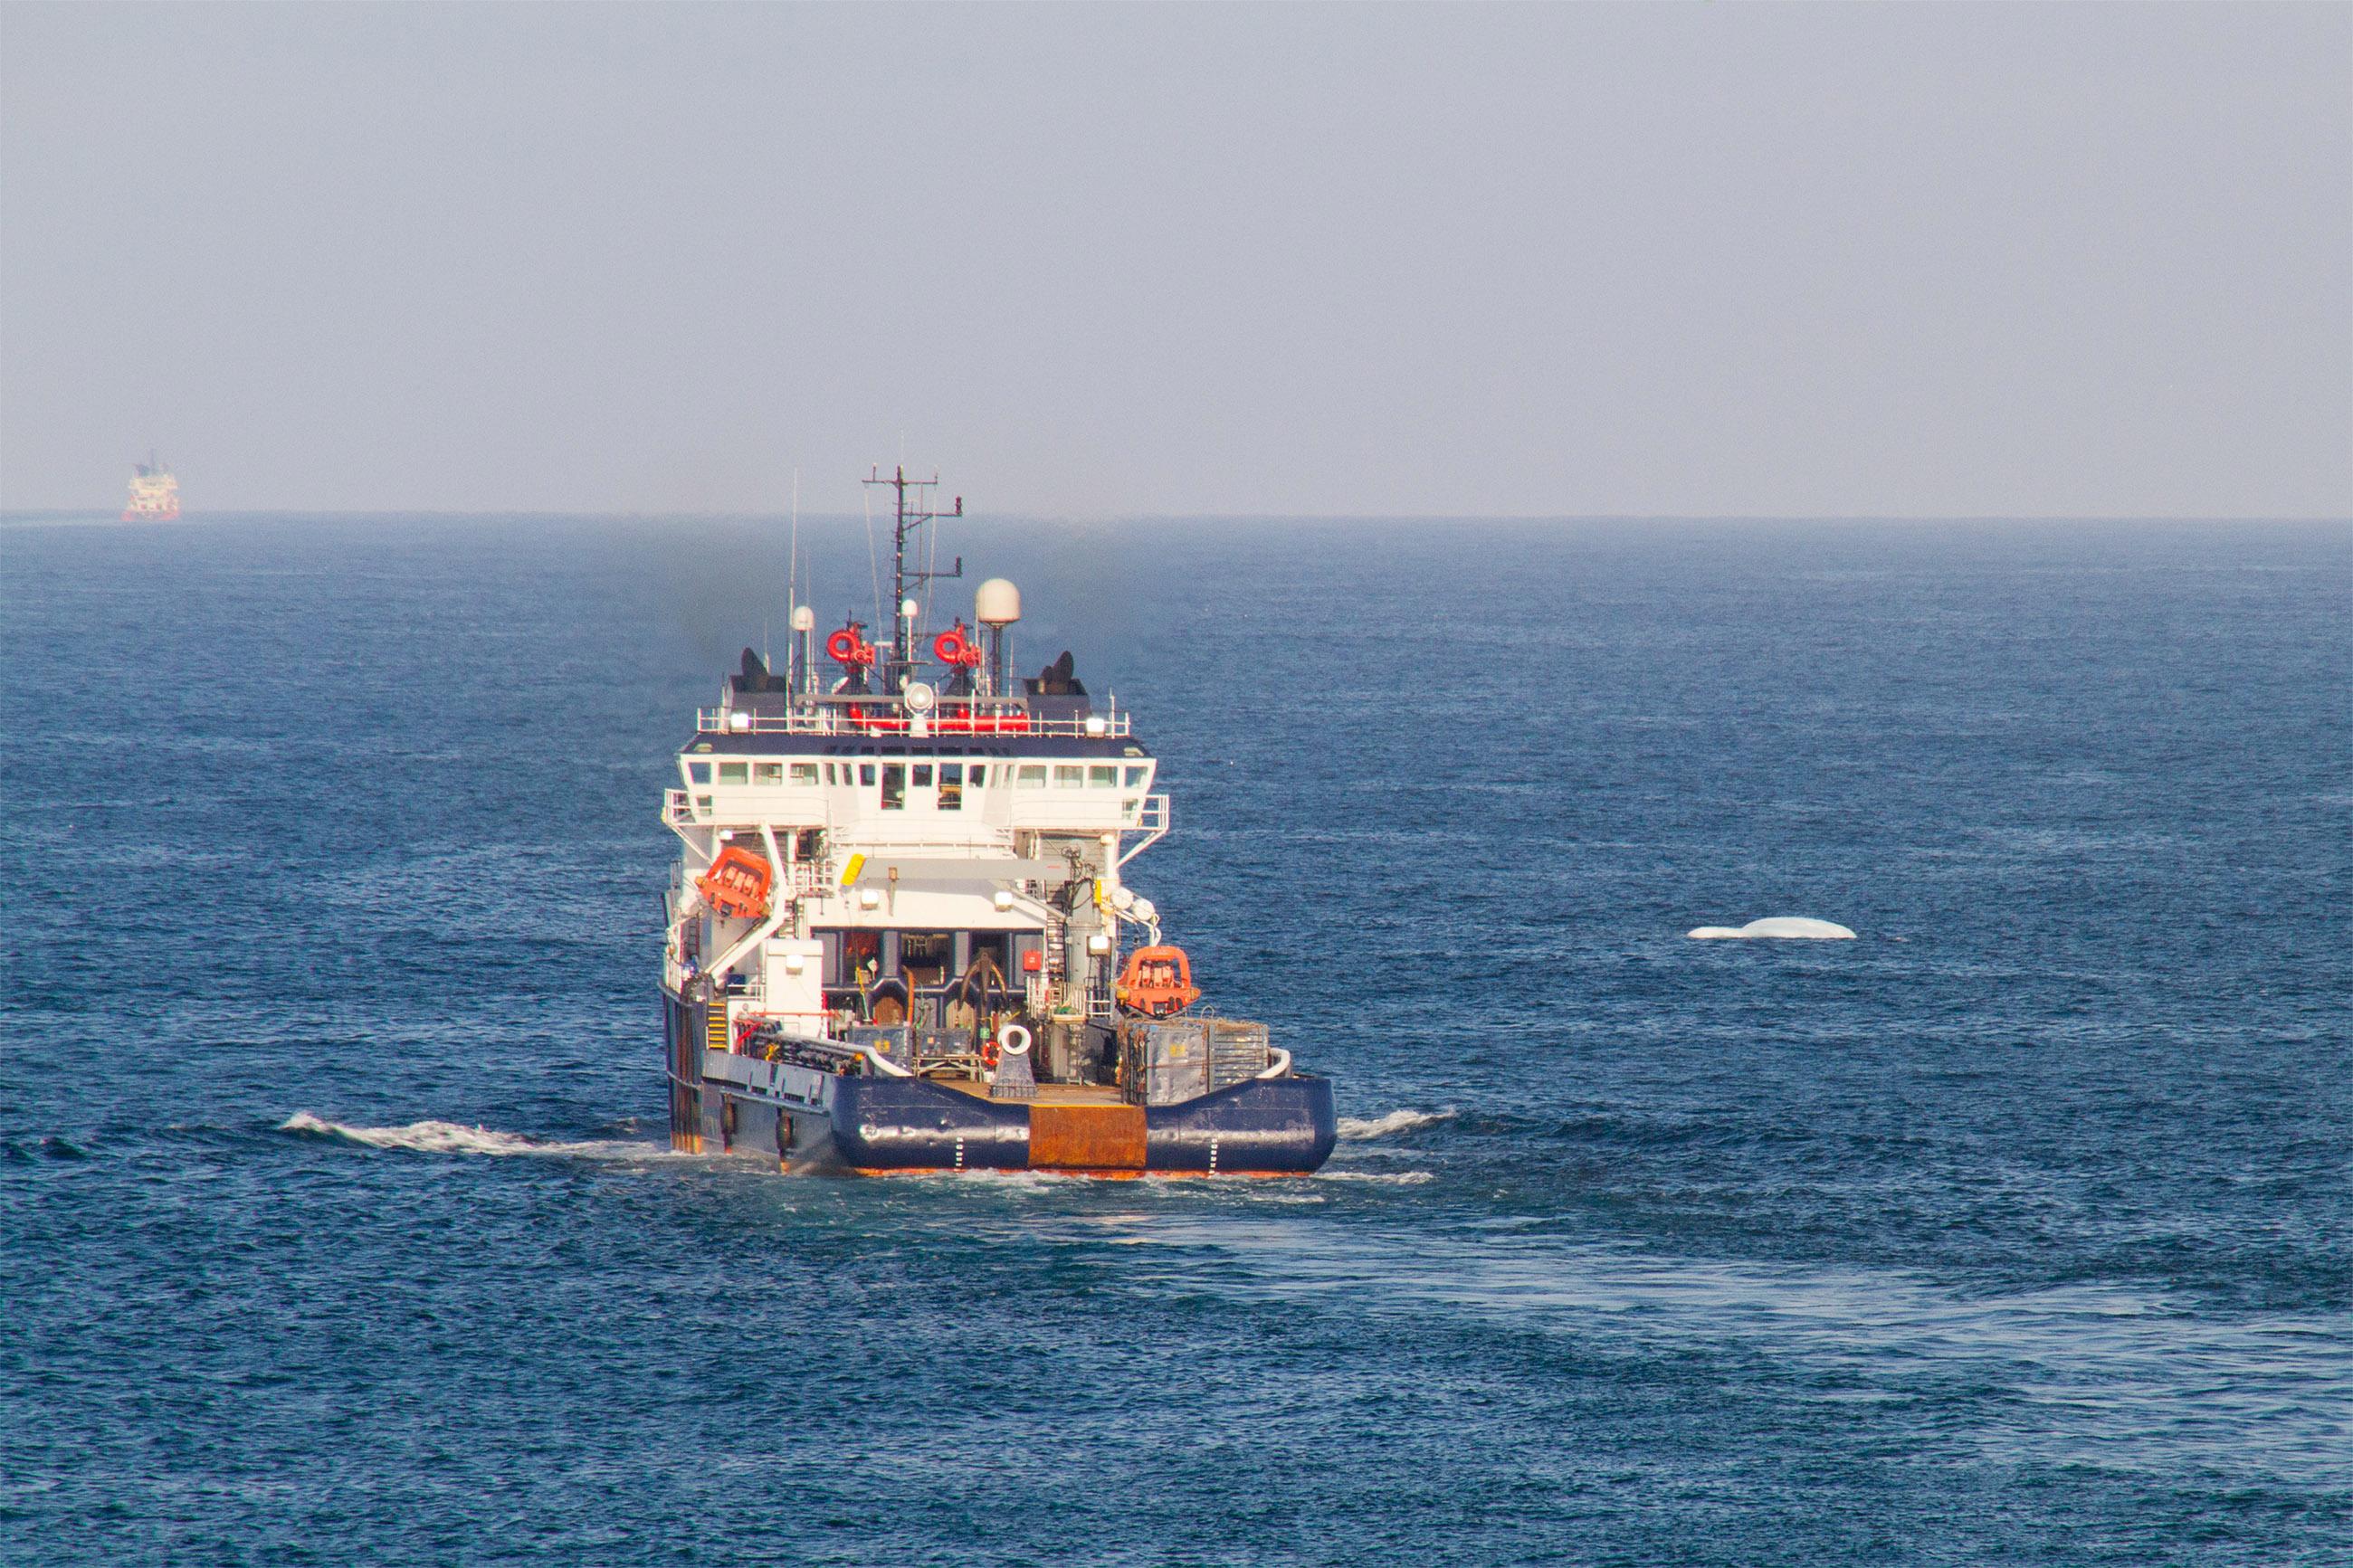 Supply vessel photo